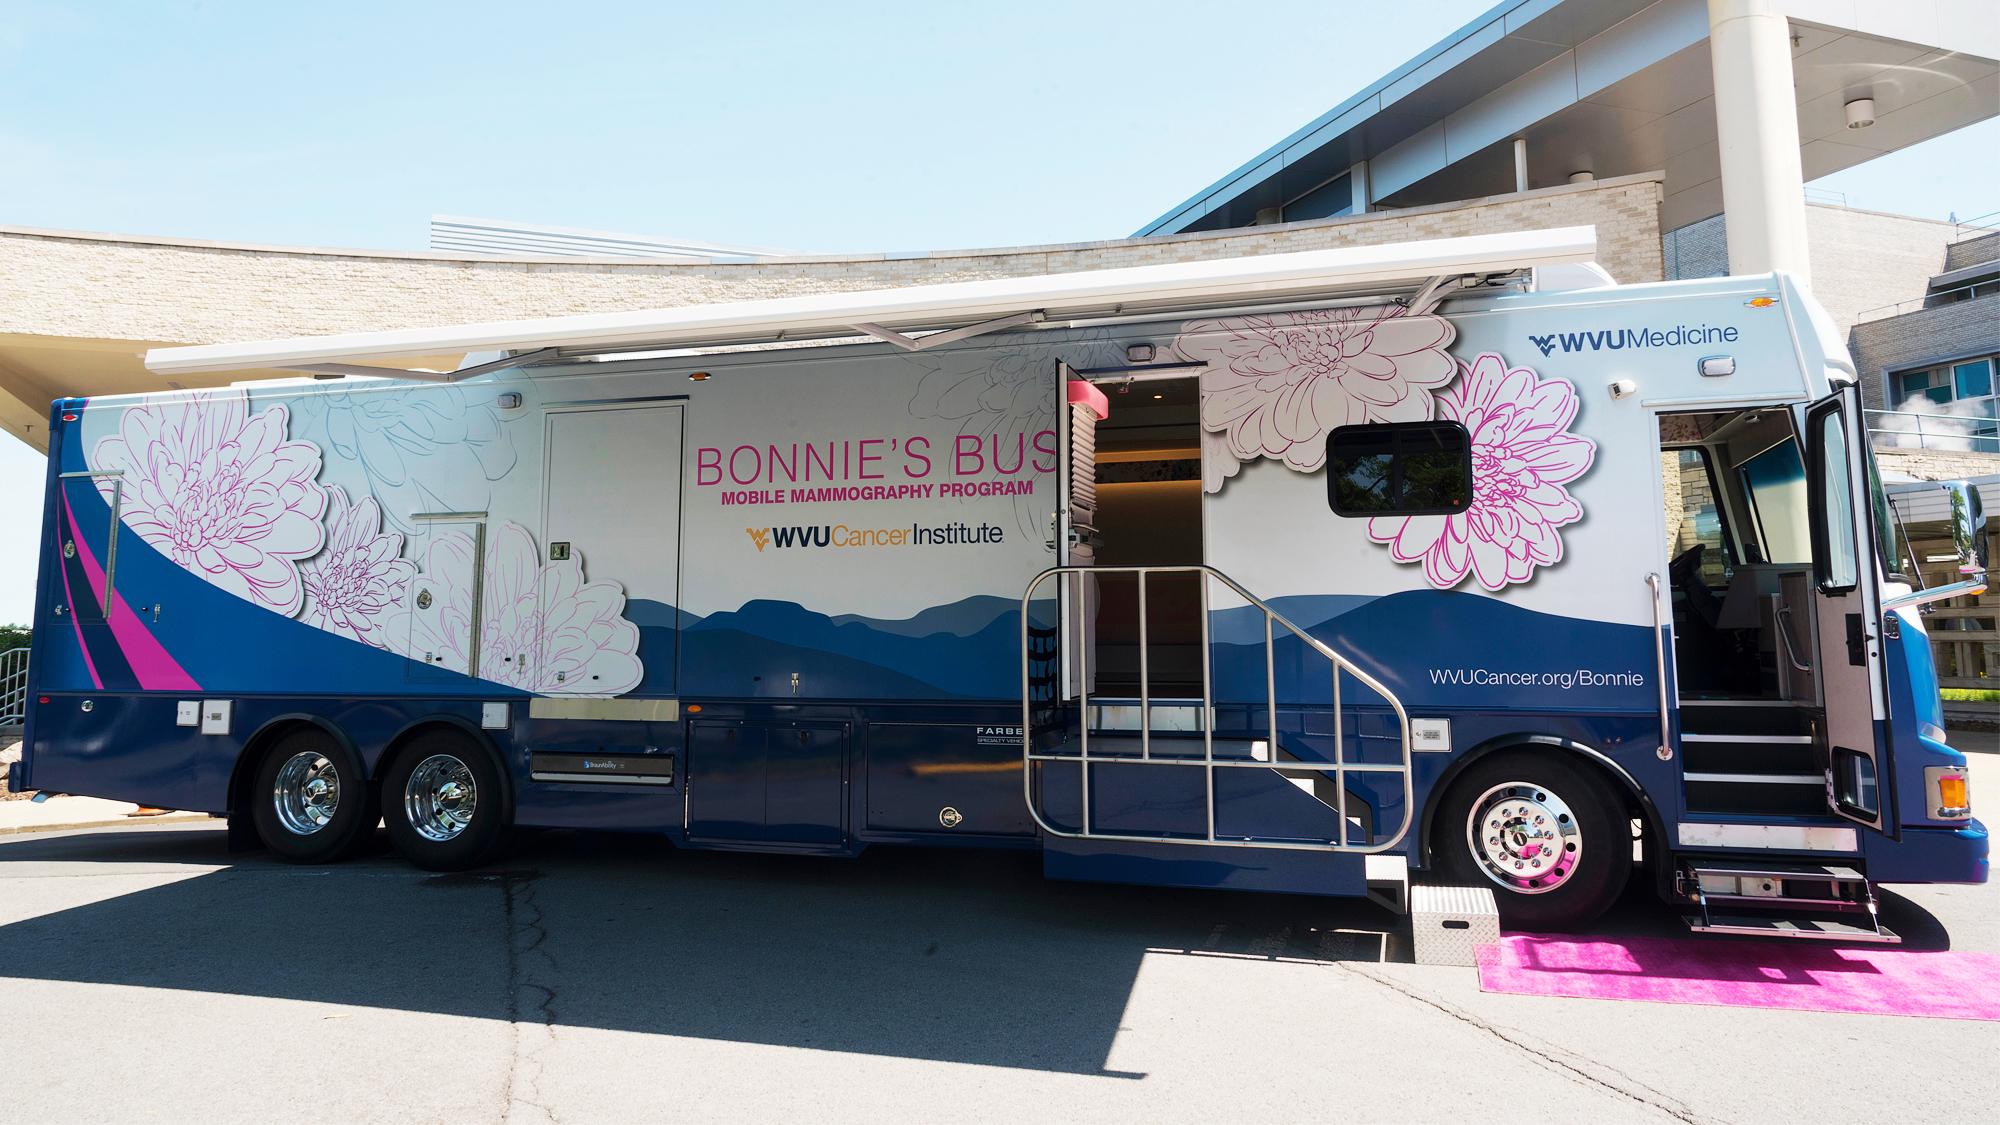 Bonnie's Bus